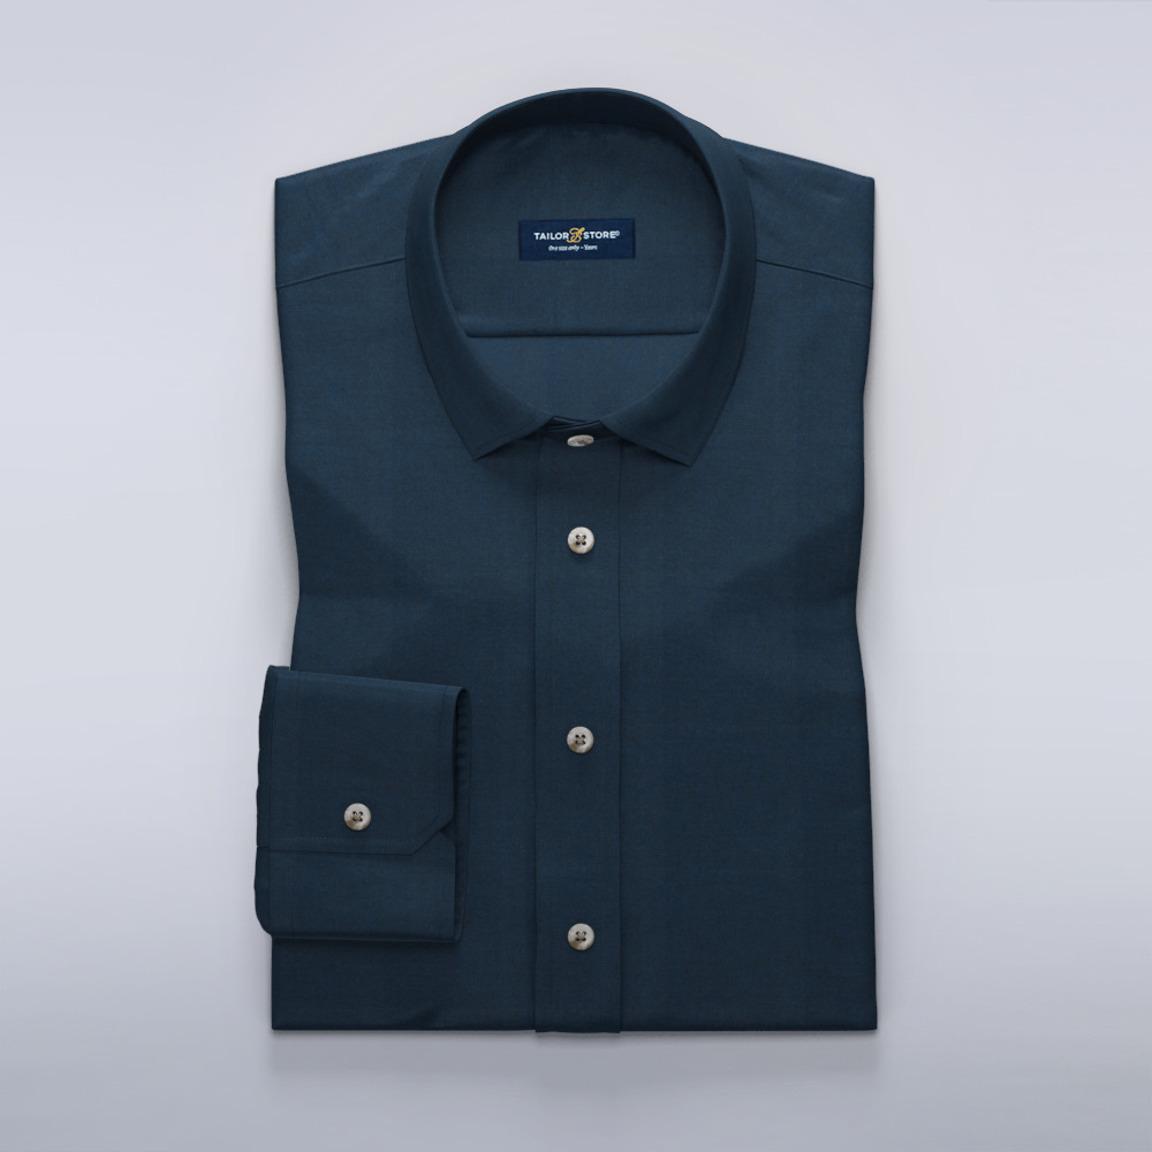 Chemise bleue marine en coton twill Tencel